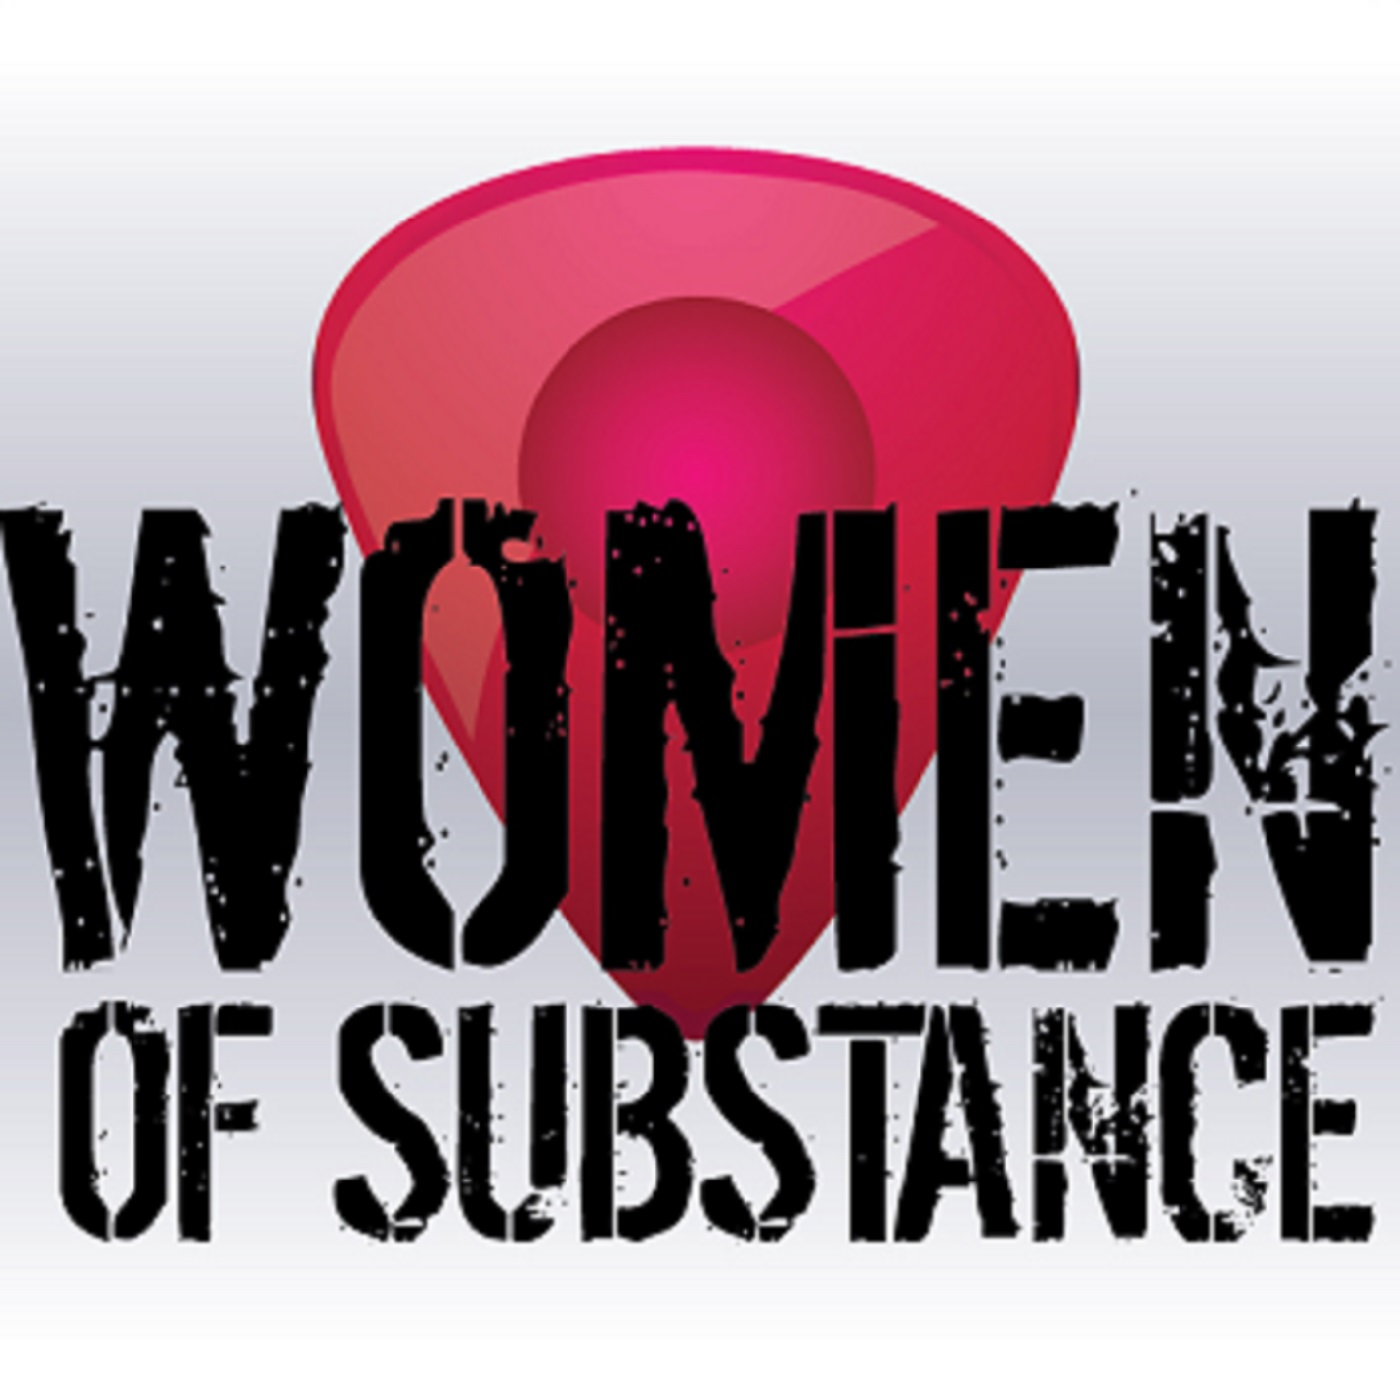 Artwork for #969 Music by Yvonne Hartman, Jacqueline Owens, Jill Detroit, Yvette Medina, Candra, Anjali Silva, Gen Lacroix, JIll Detroit, Yvette Medina